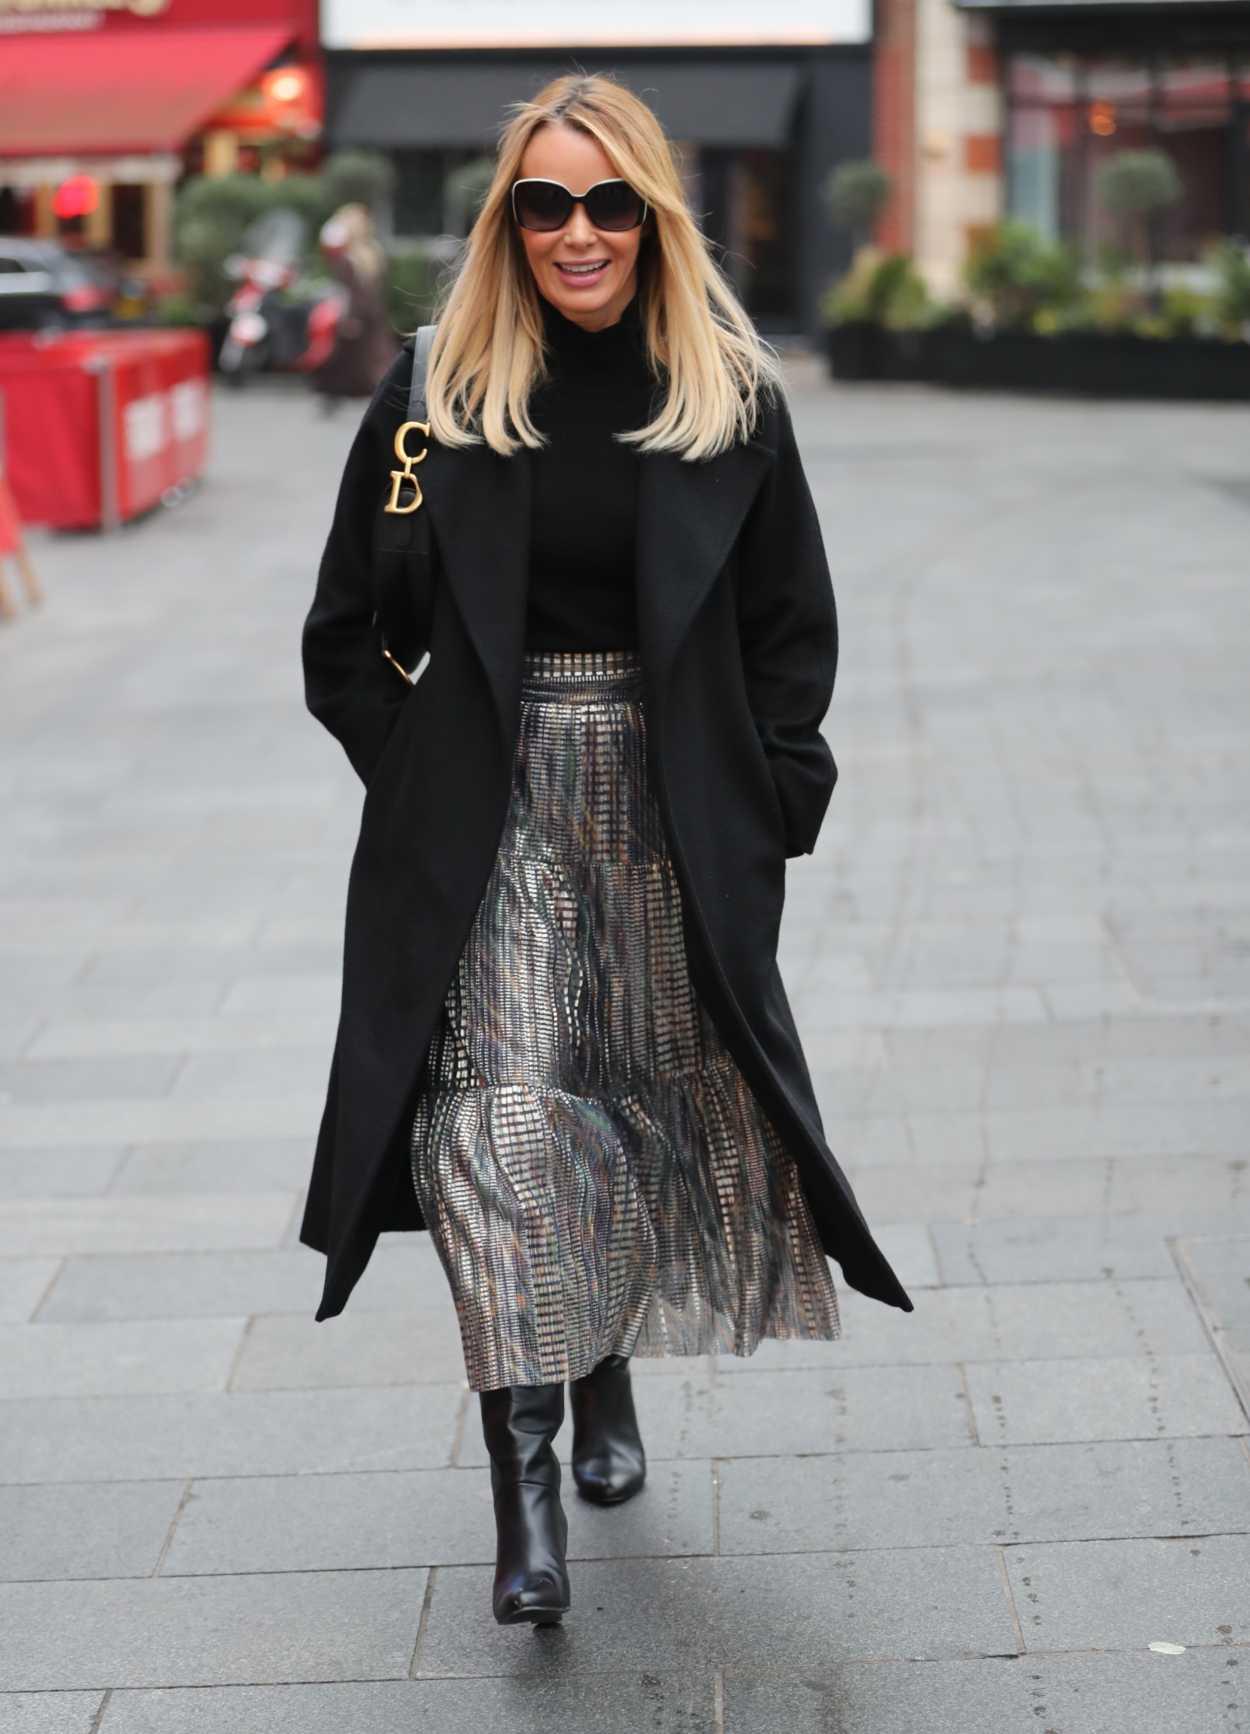 Amanda Holden in a Black Coat Leaves the Heart Radio Studios in London 01/22/2020